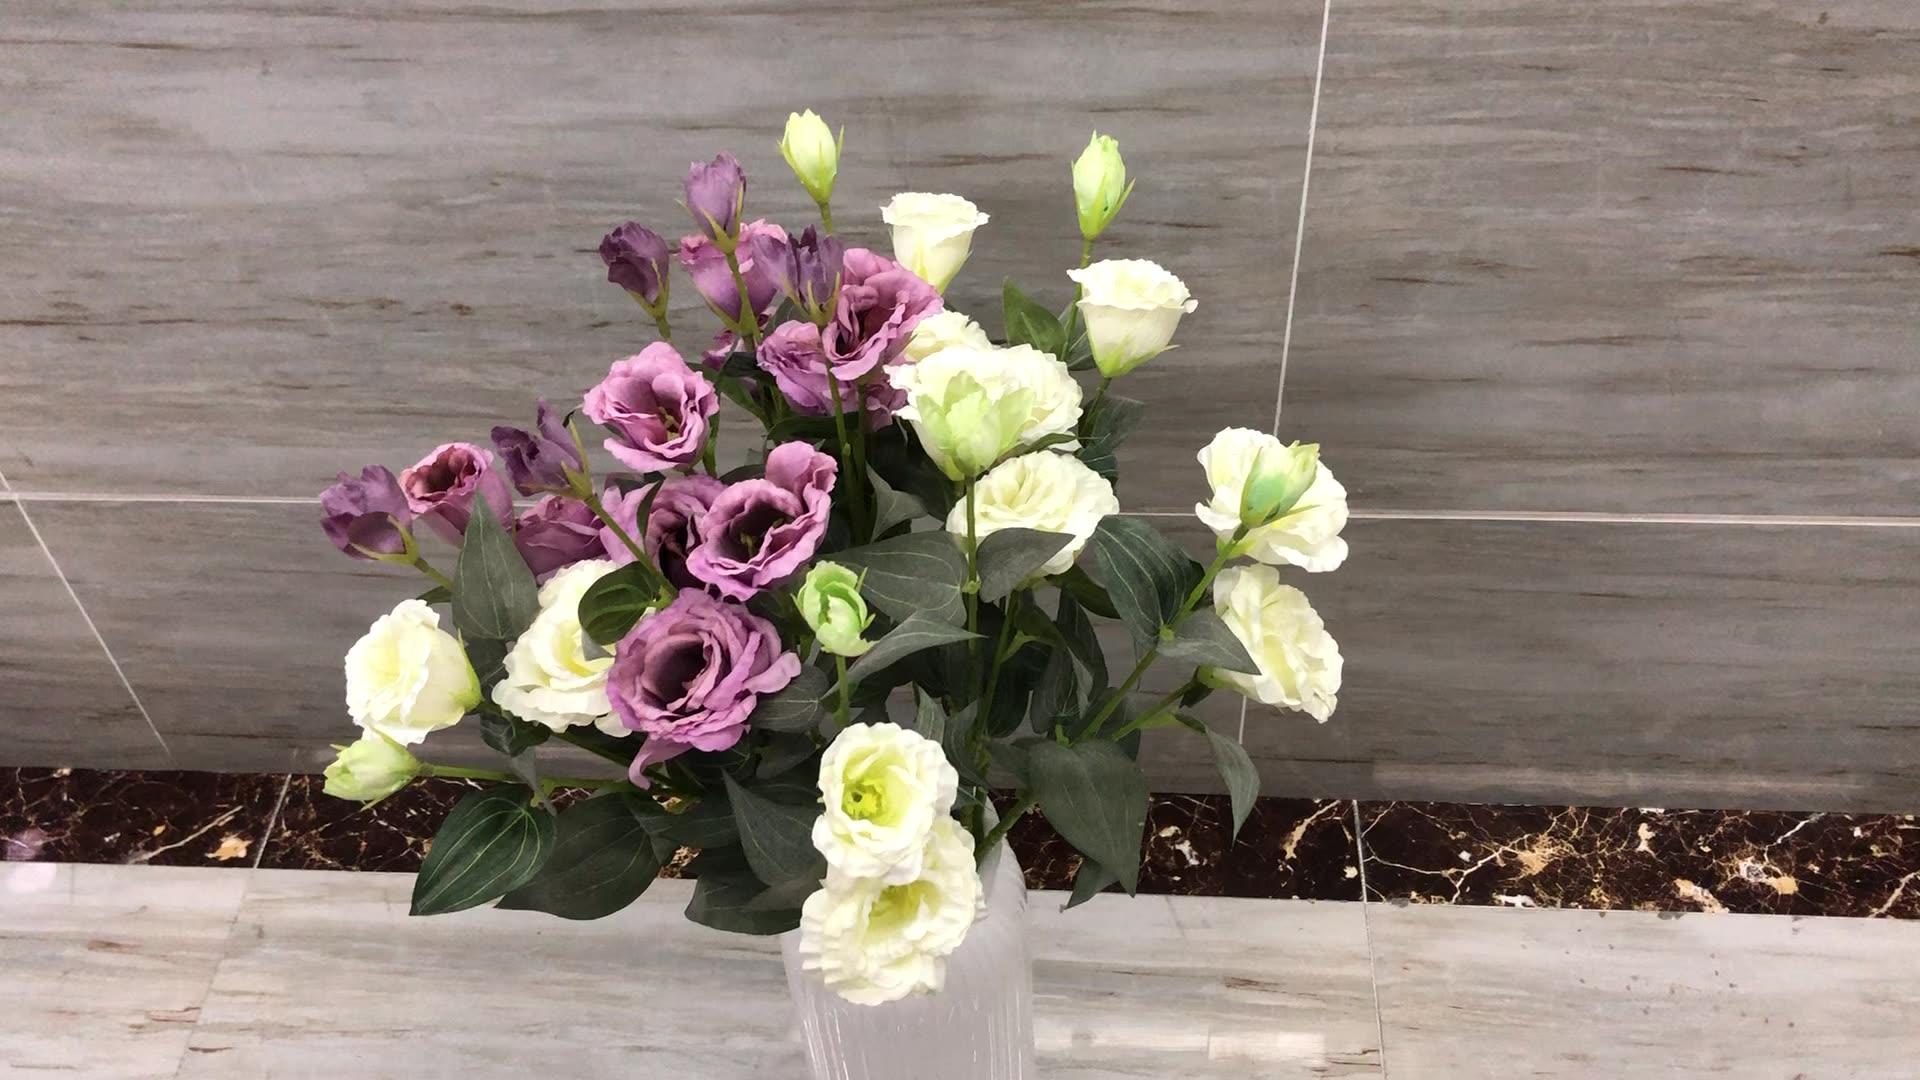 QSLH-C1326 High Quality Decorative Artificial Flowers Silk 3 Heads Lisianthus for Wedding